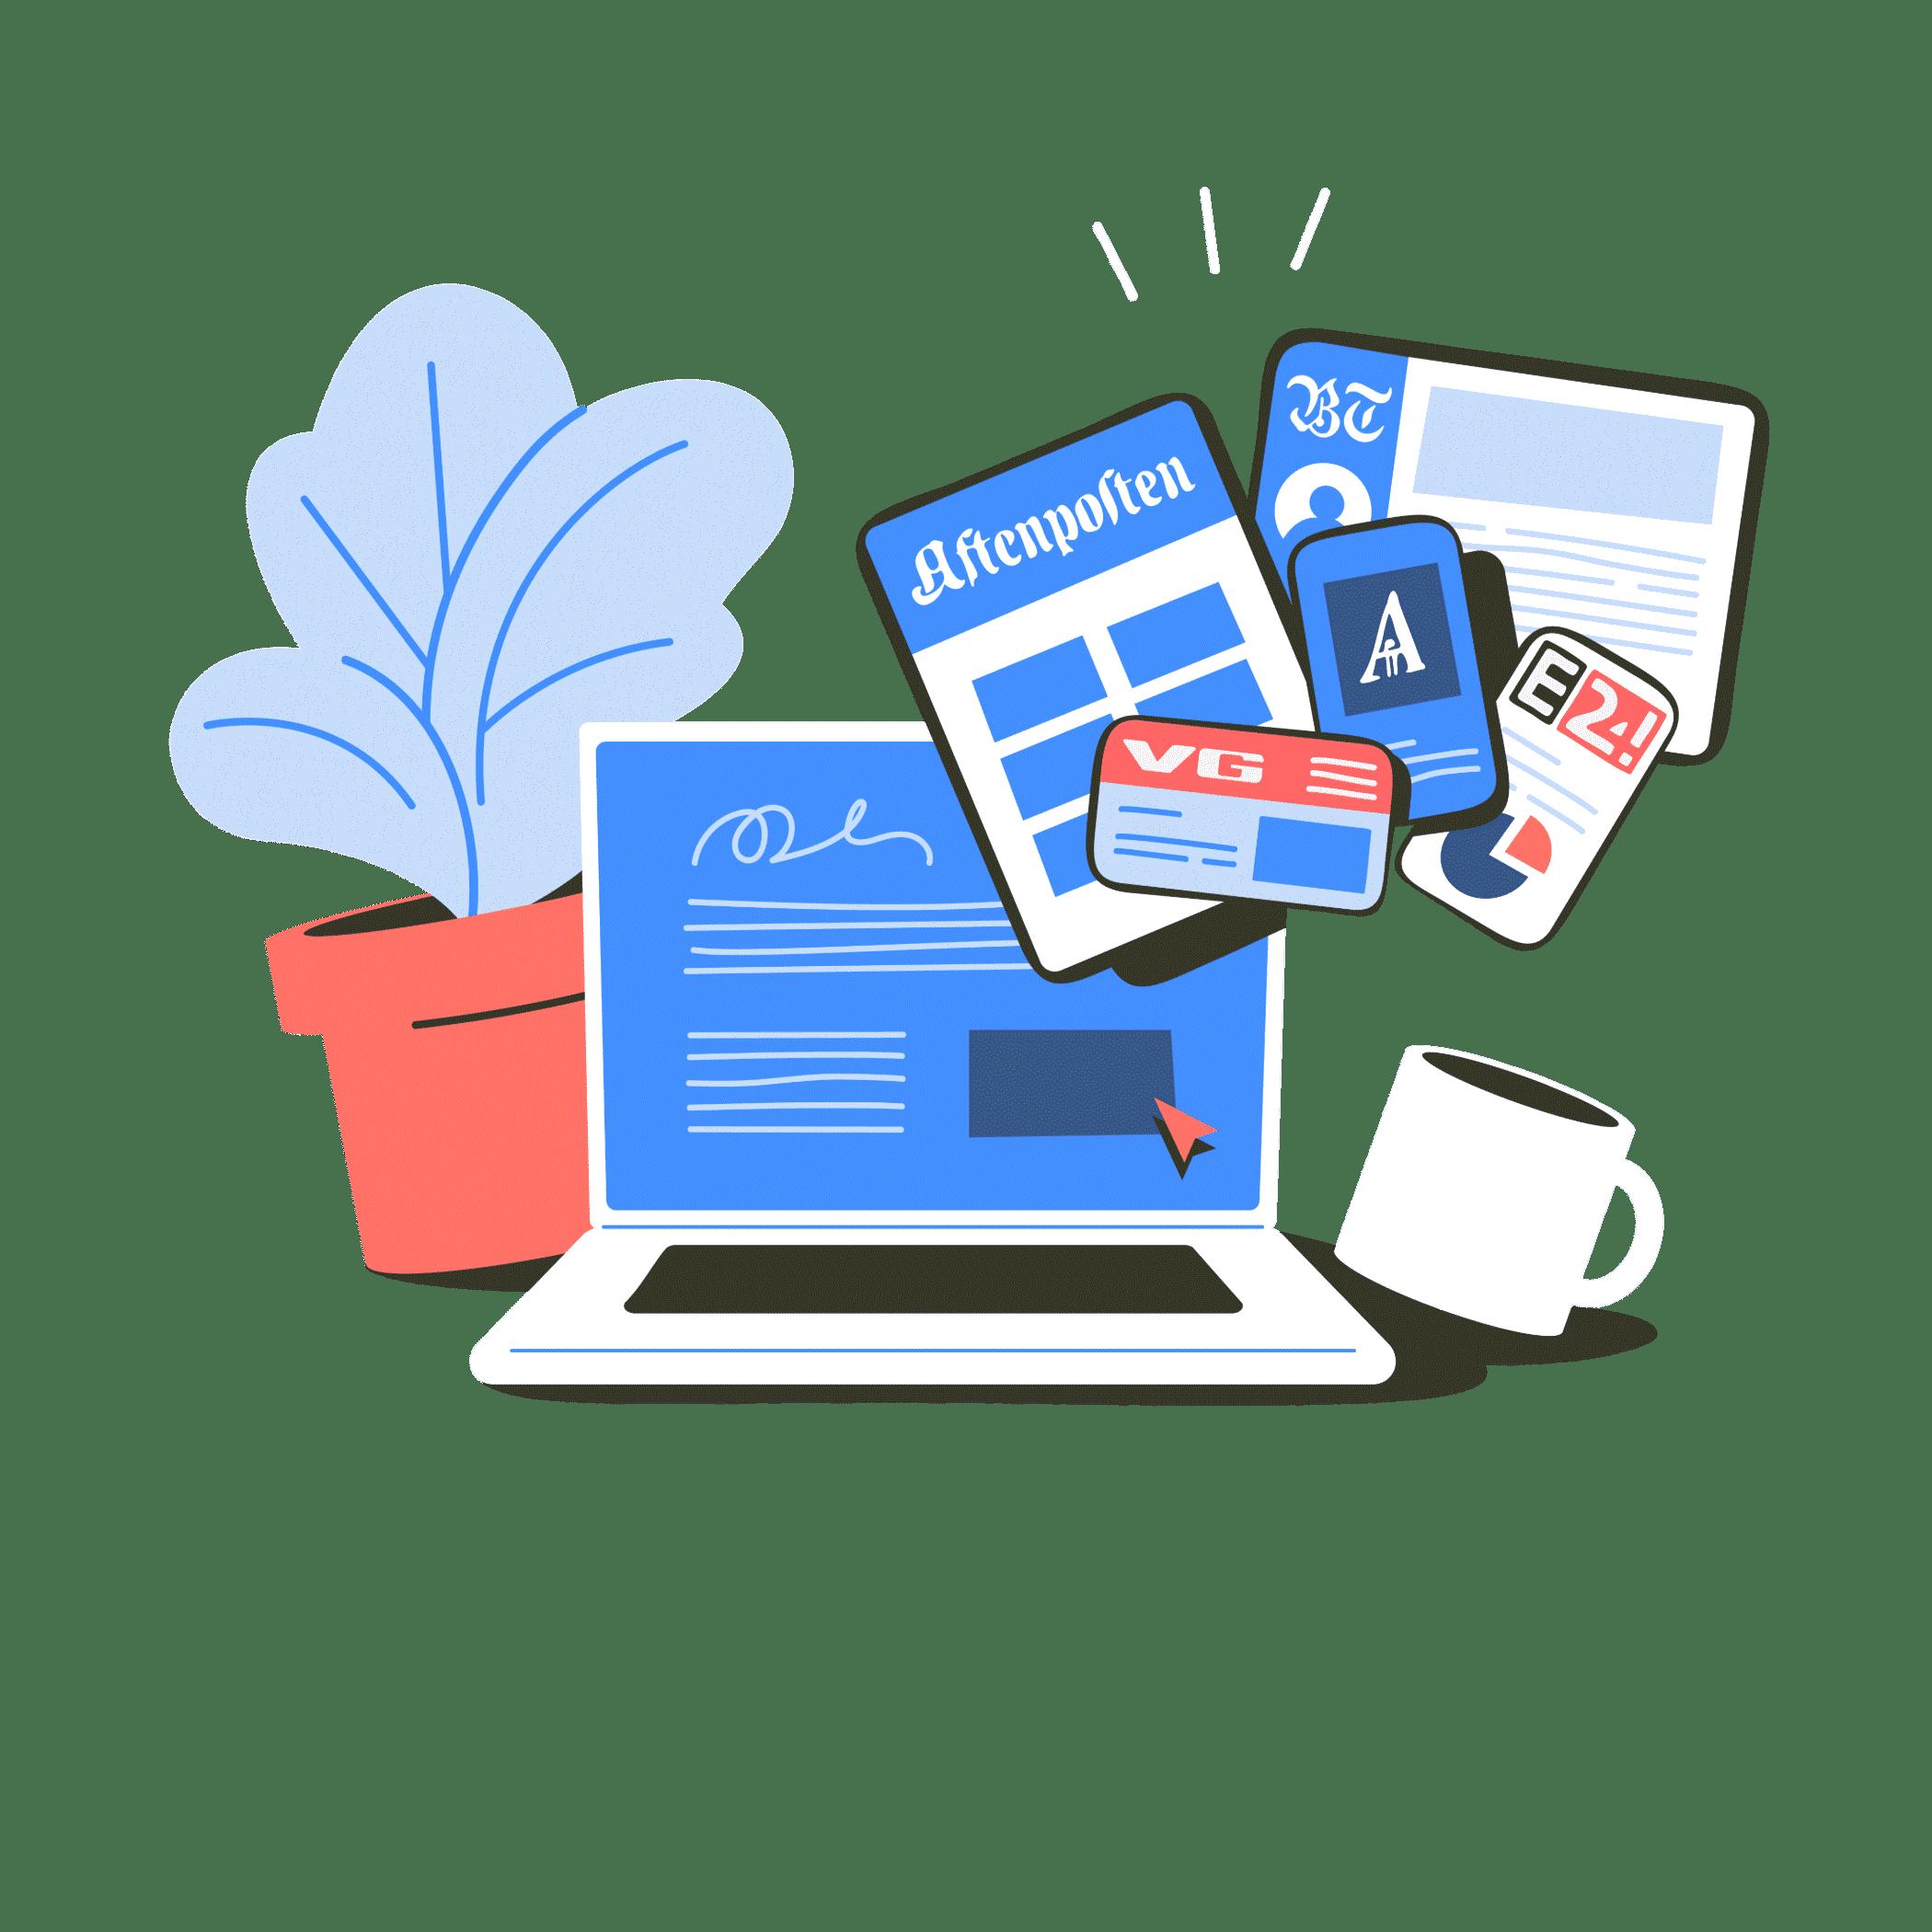 Personal computer, Product, Cartoon, Laptop, Gesture, Font